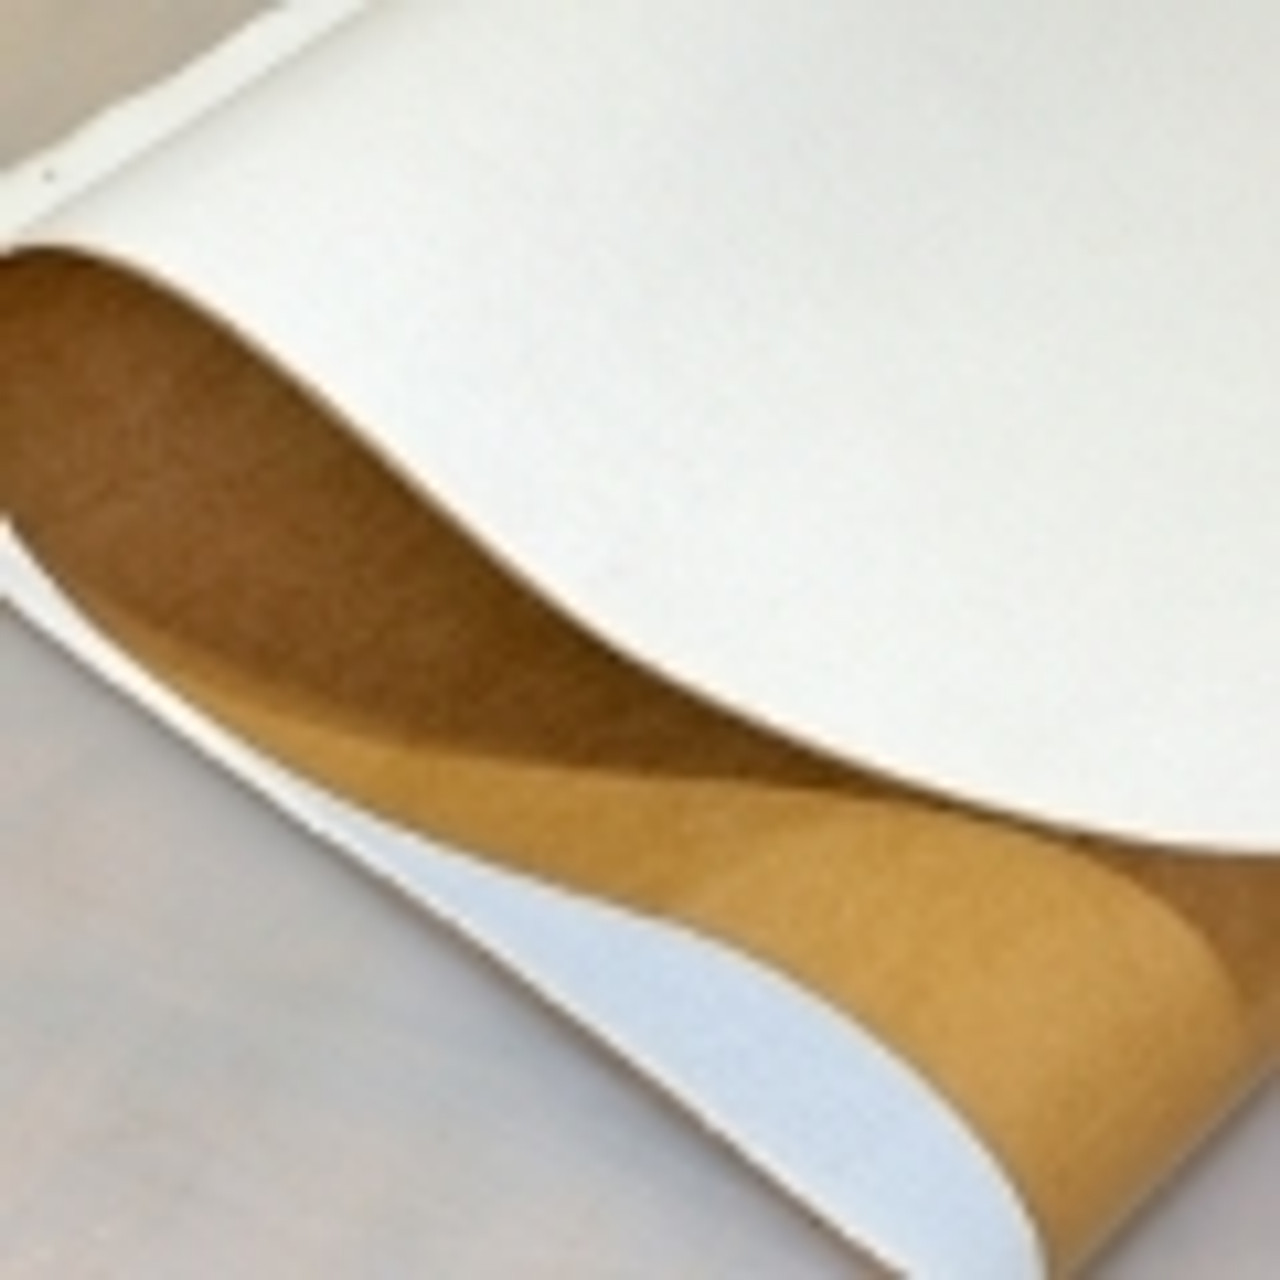 White Polyester, Adhesive Backed